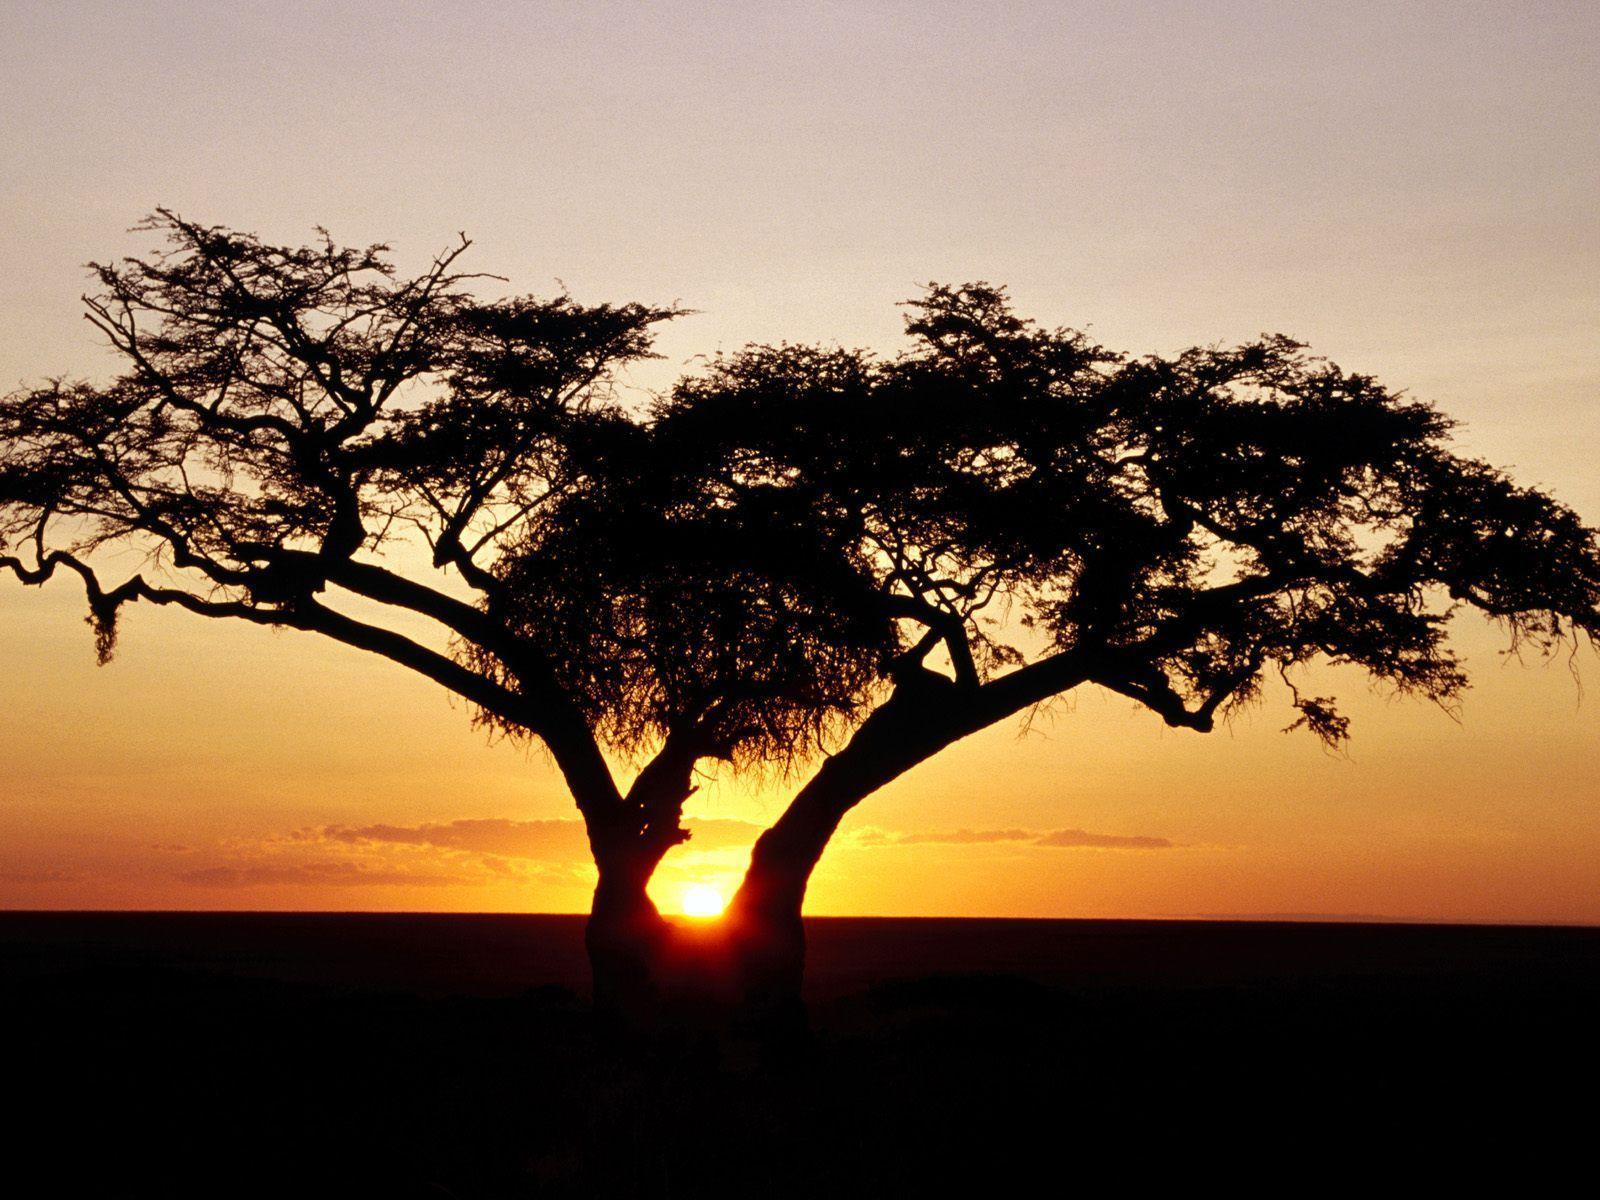 Sunrise, Africa desktop wallpaper « Desktopia.